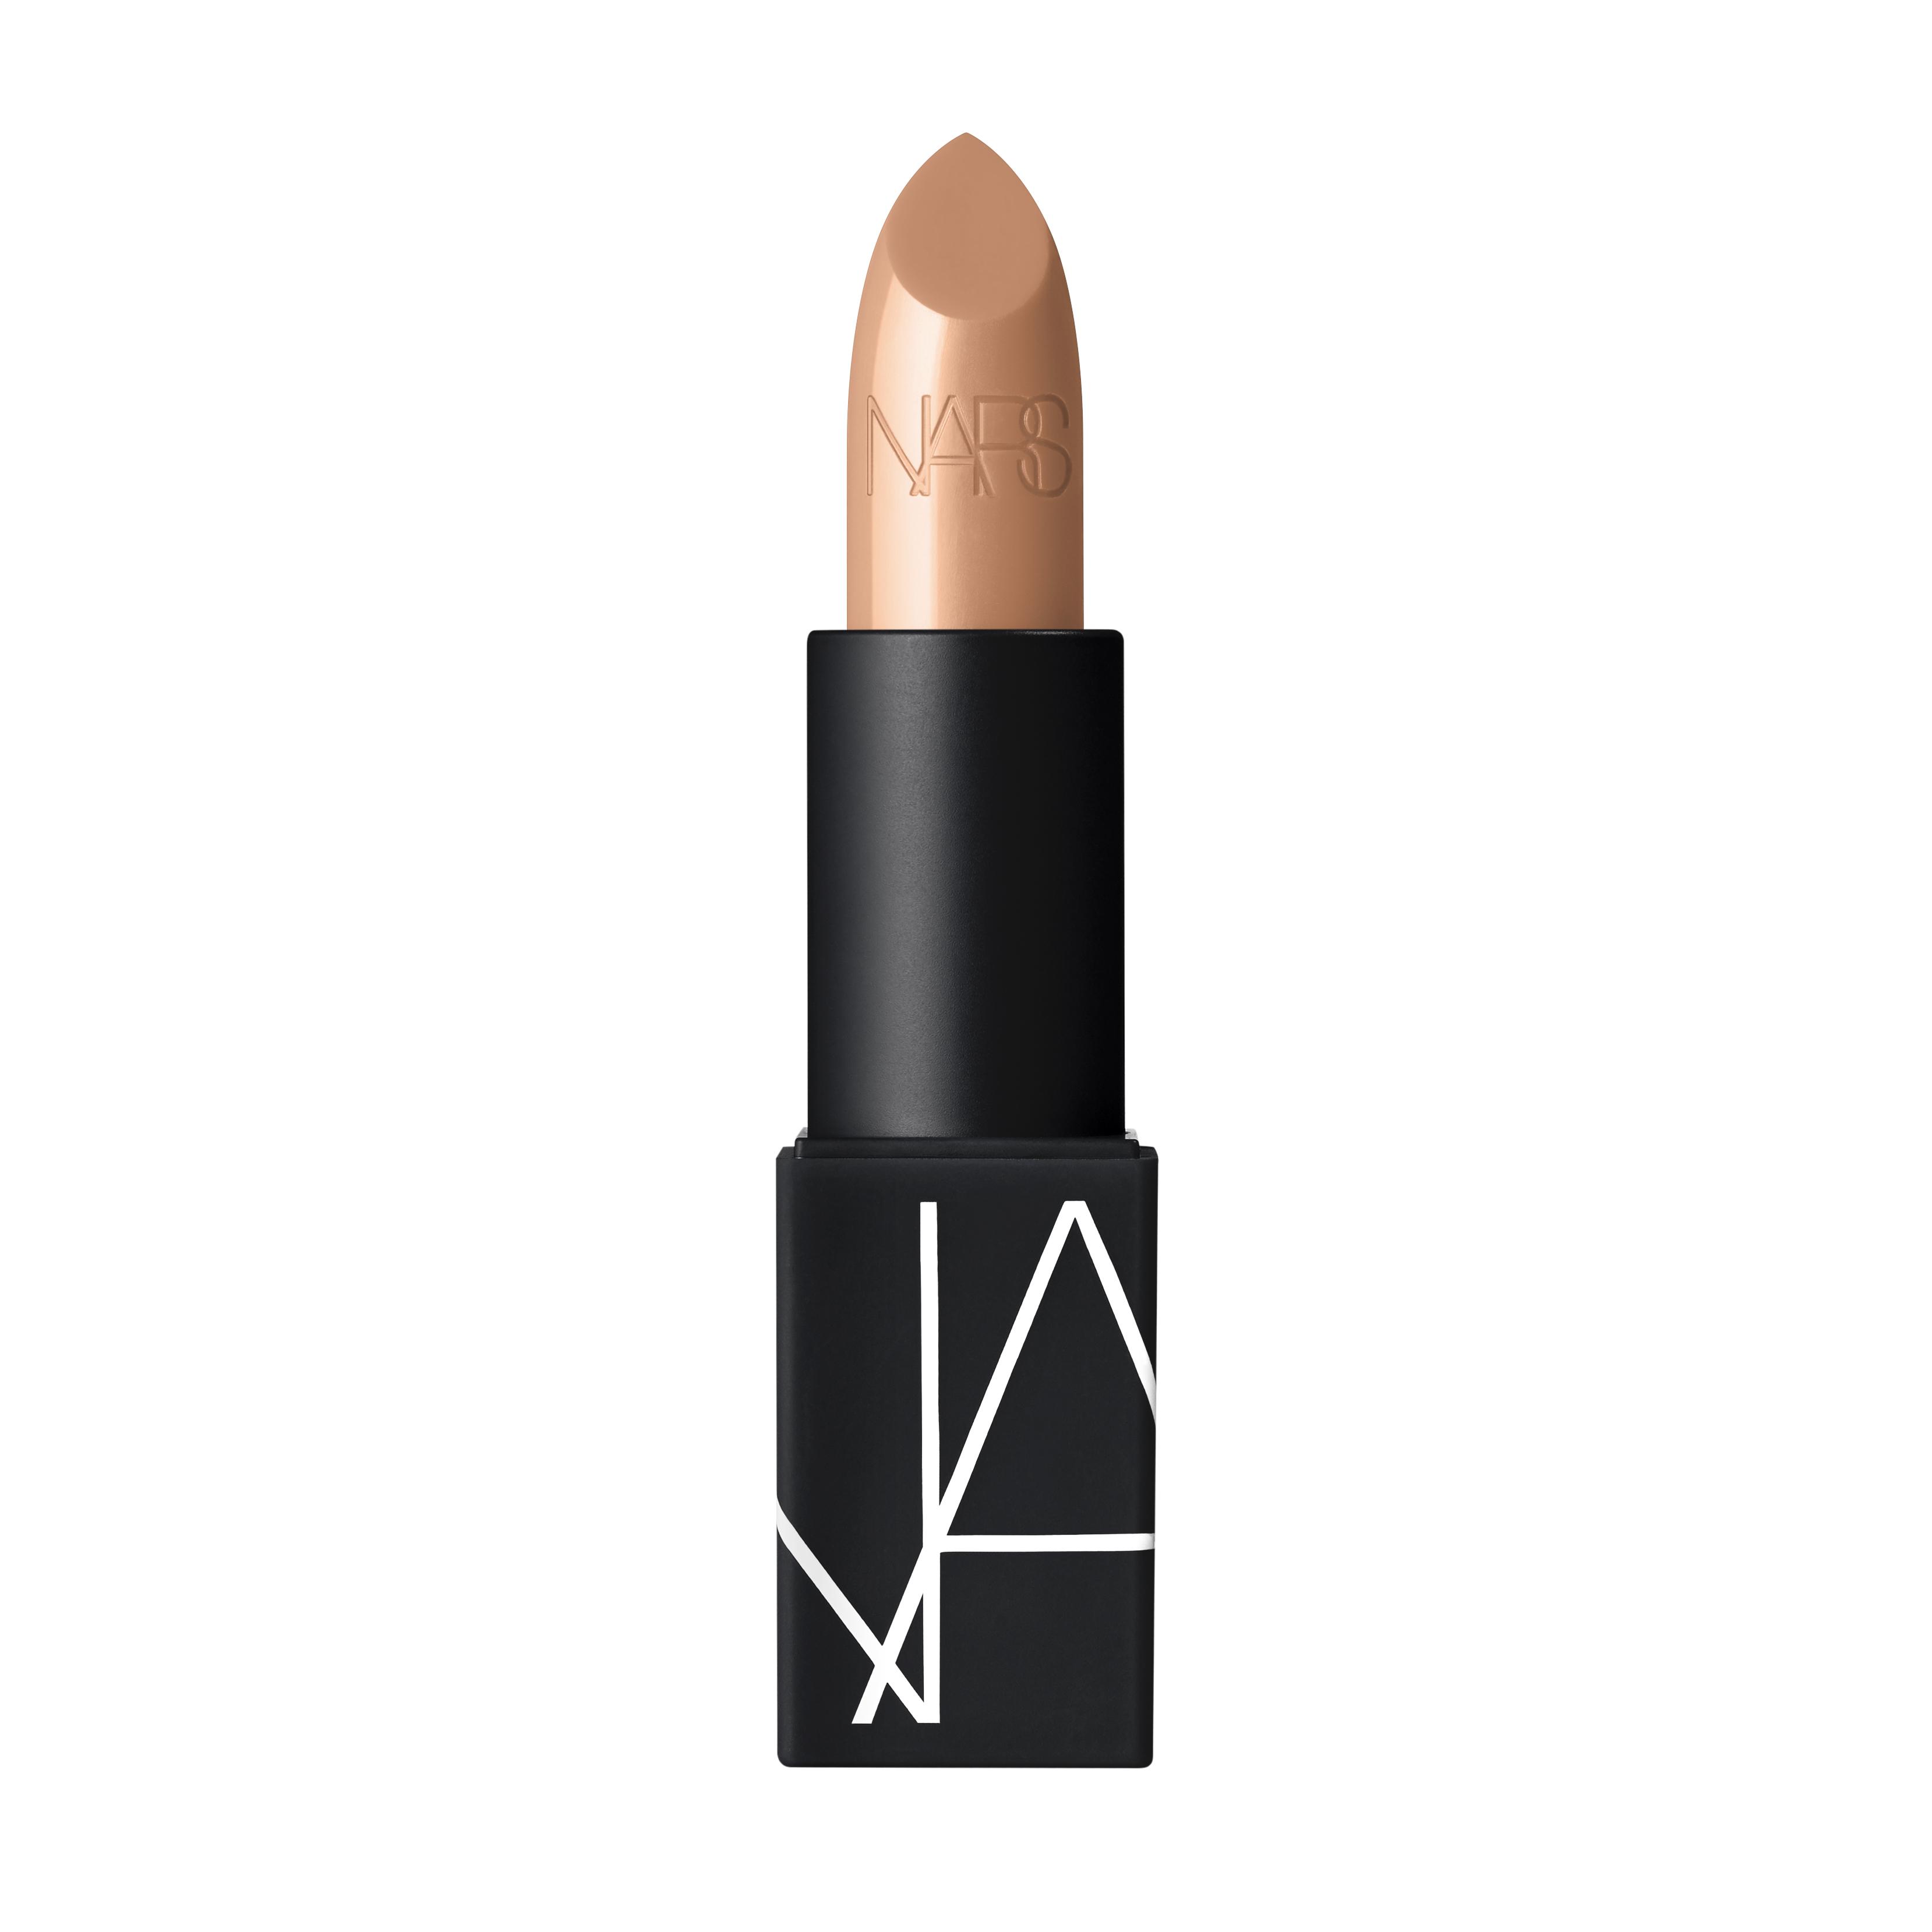 NARS Belle du Jour Sheer Lipstick Product Image